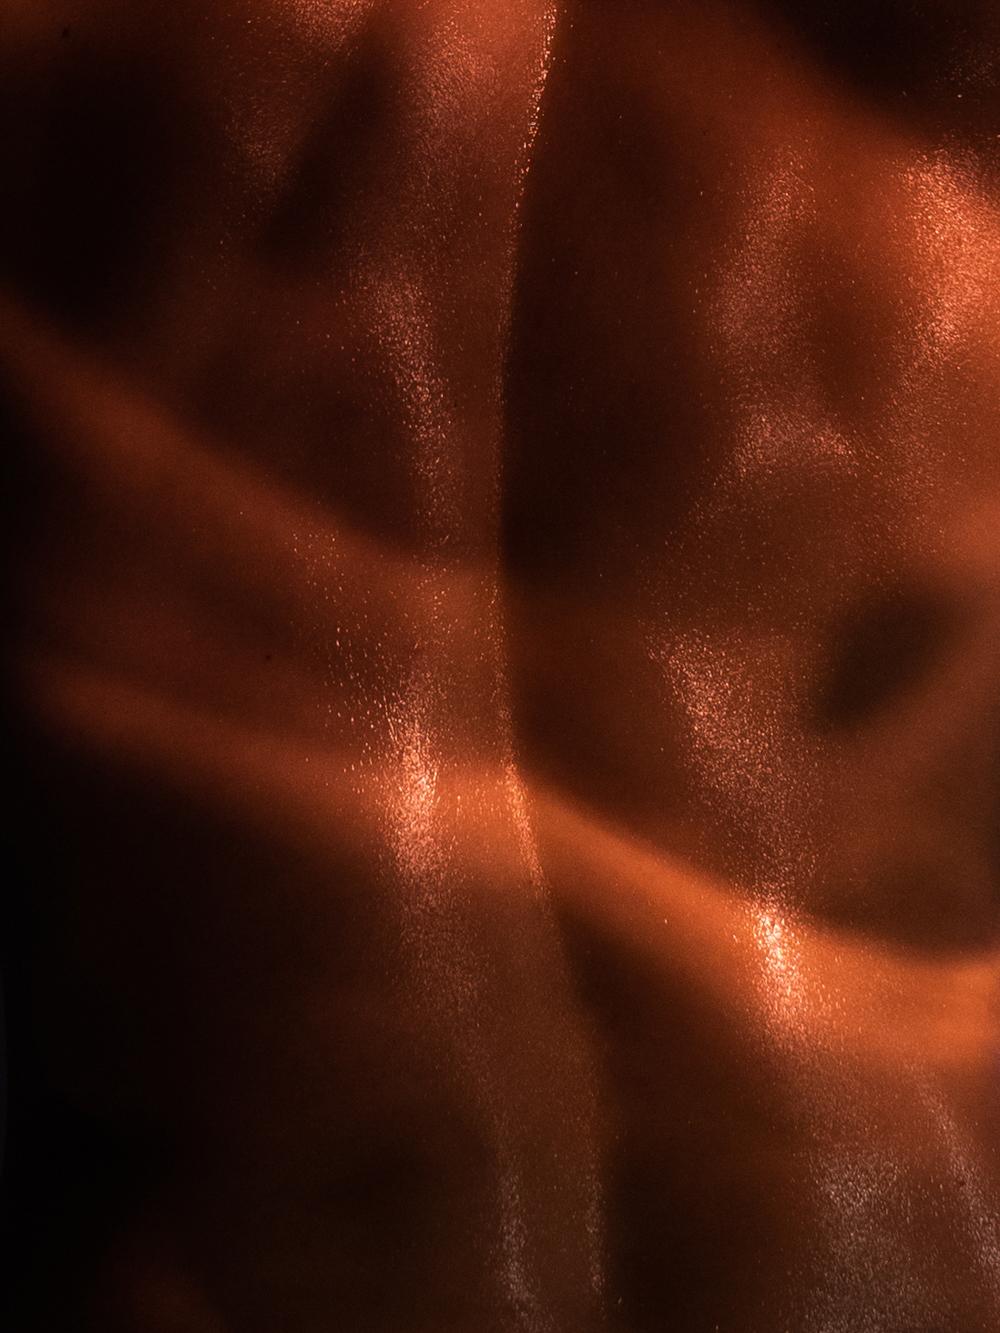 Ближе к телу: специальная съемка Louis Vuitton x BURO. (фото 18)